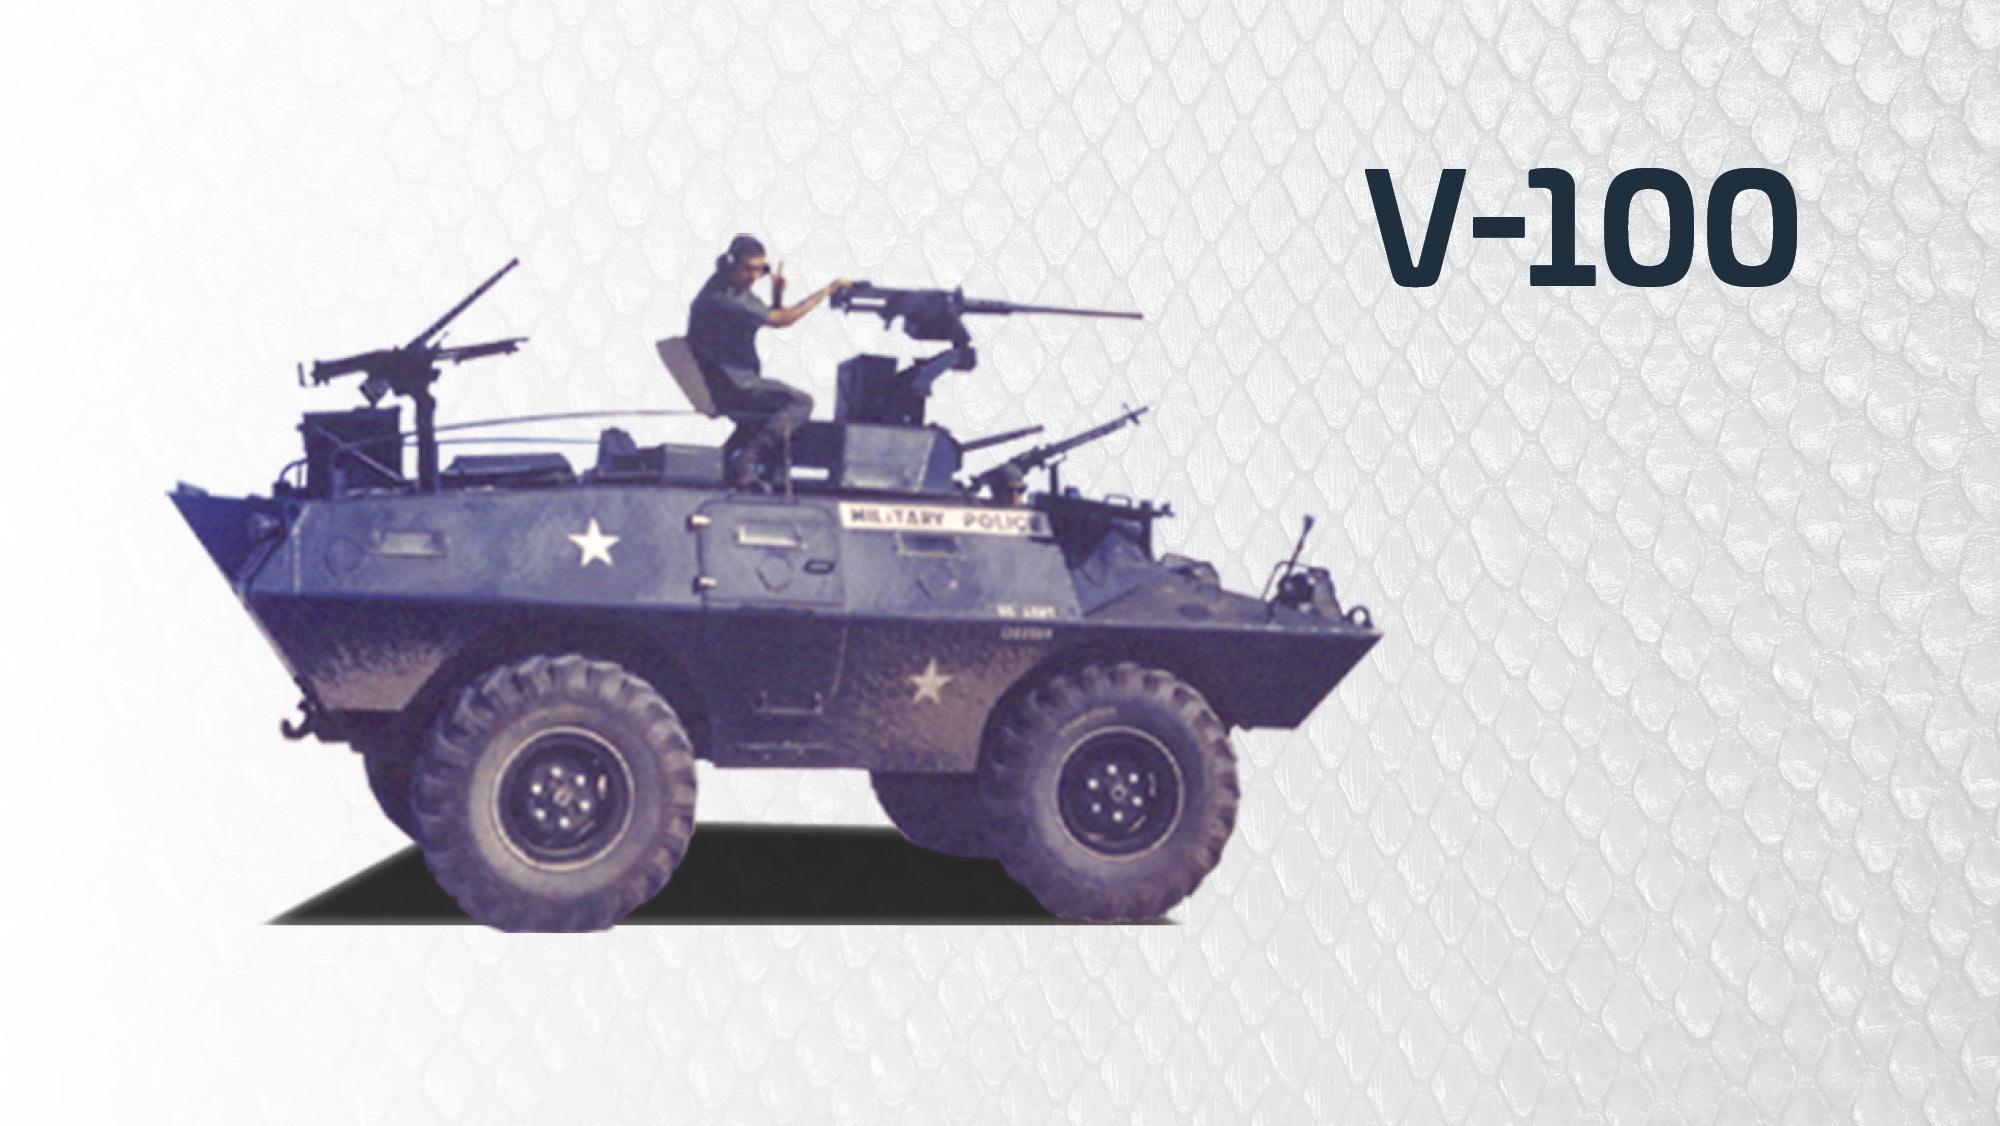 Textron Systems V-100